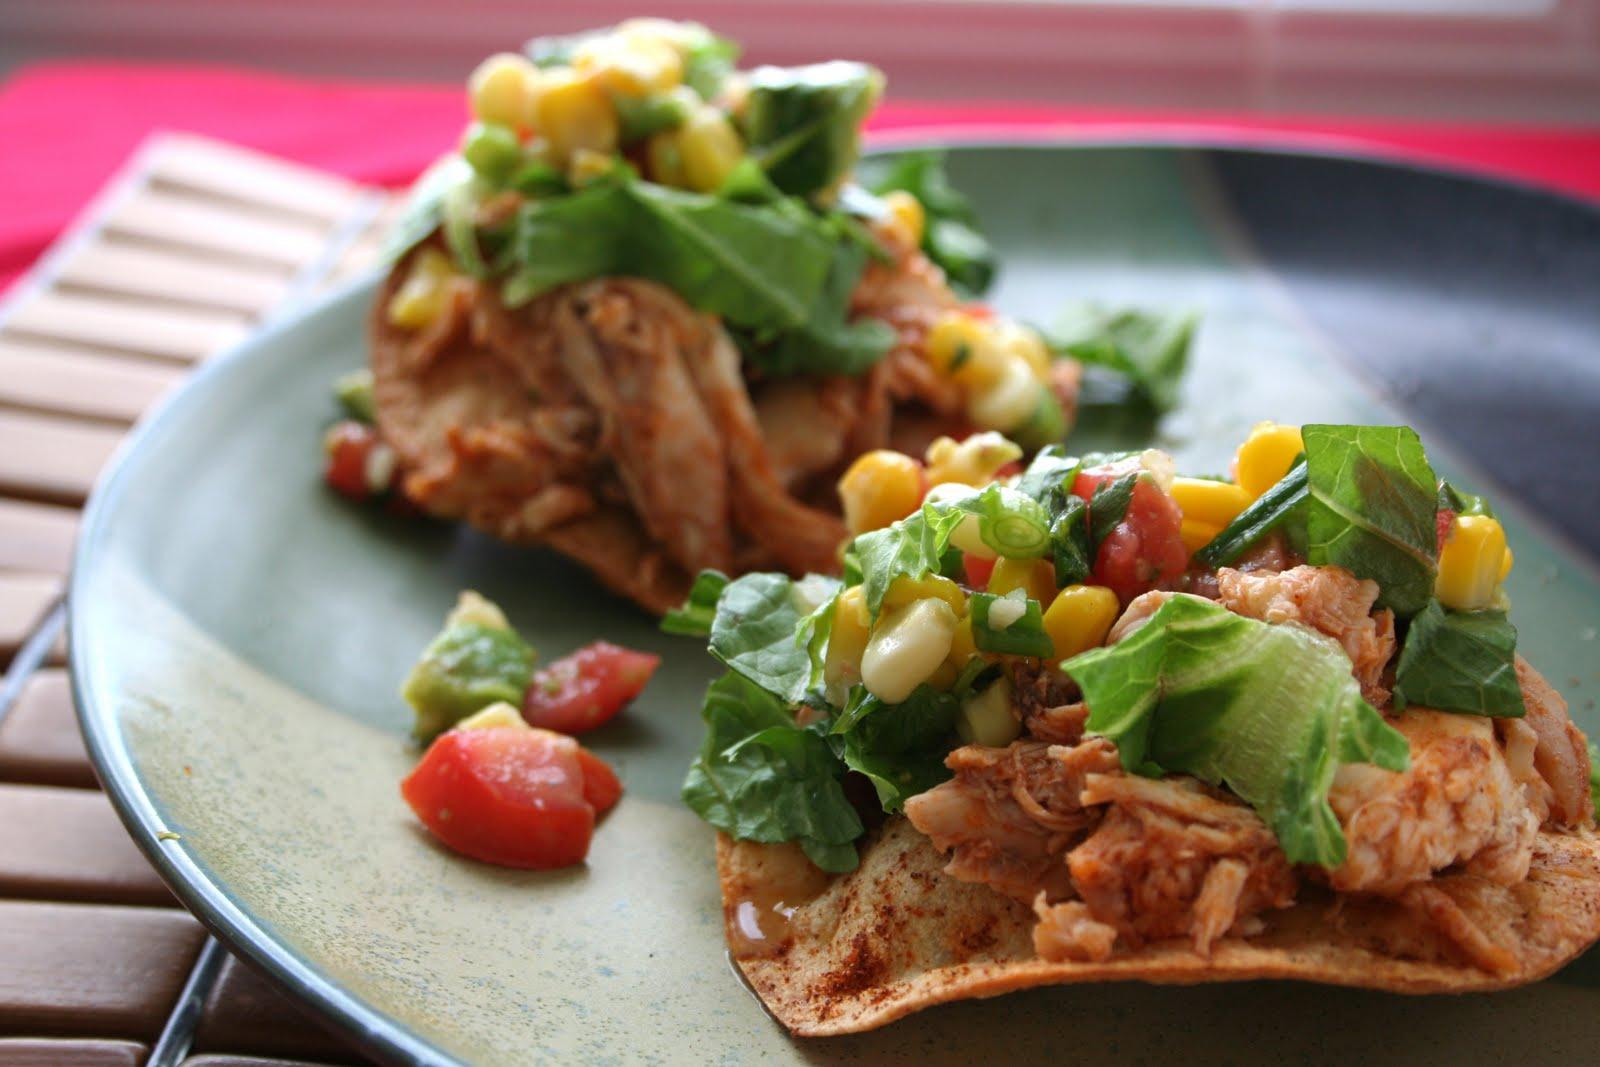 how to use corn tostadas